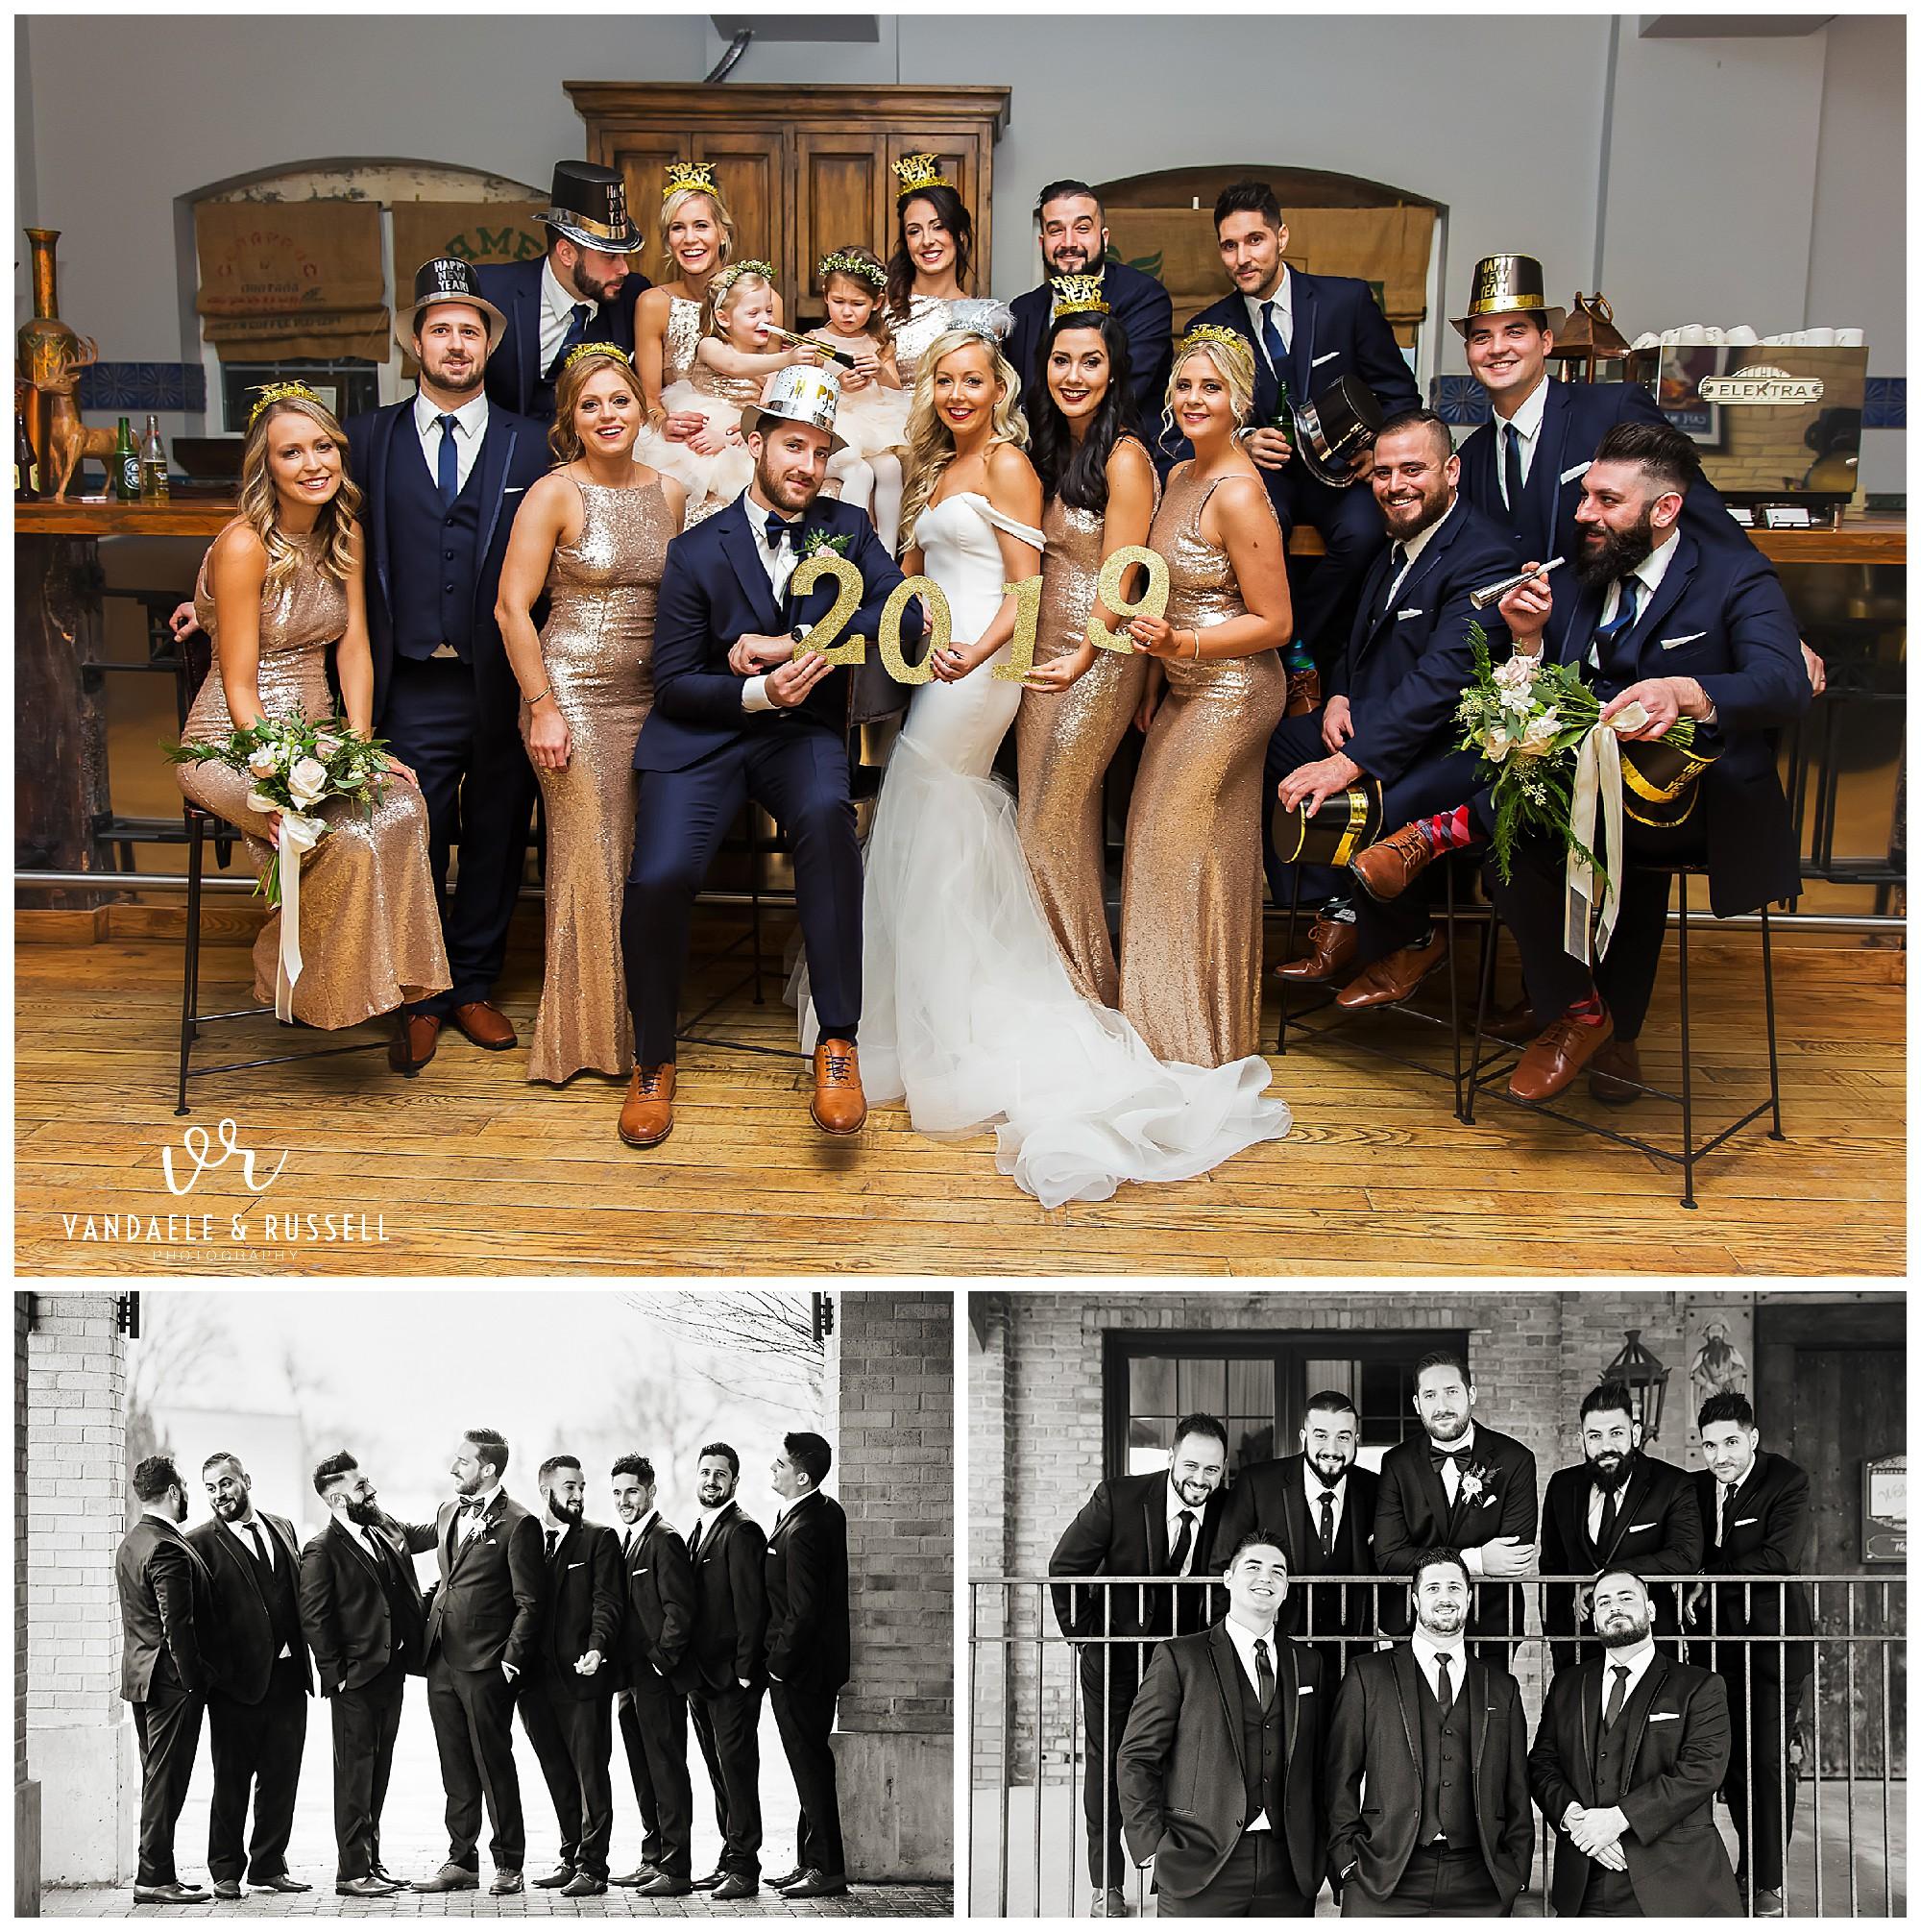 Hacienda-Sarria-Wedding-Photos-NYE-Michelle-Matt-VanDaele-Russell_0022.jpg